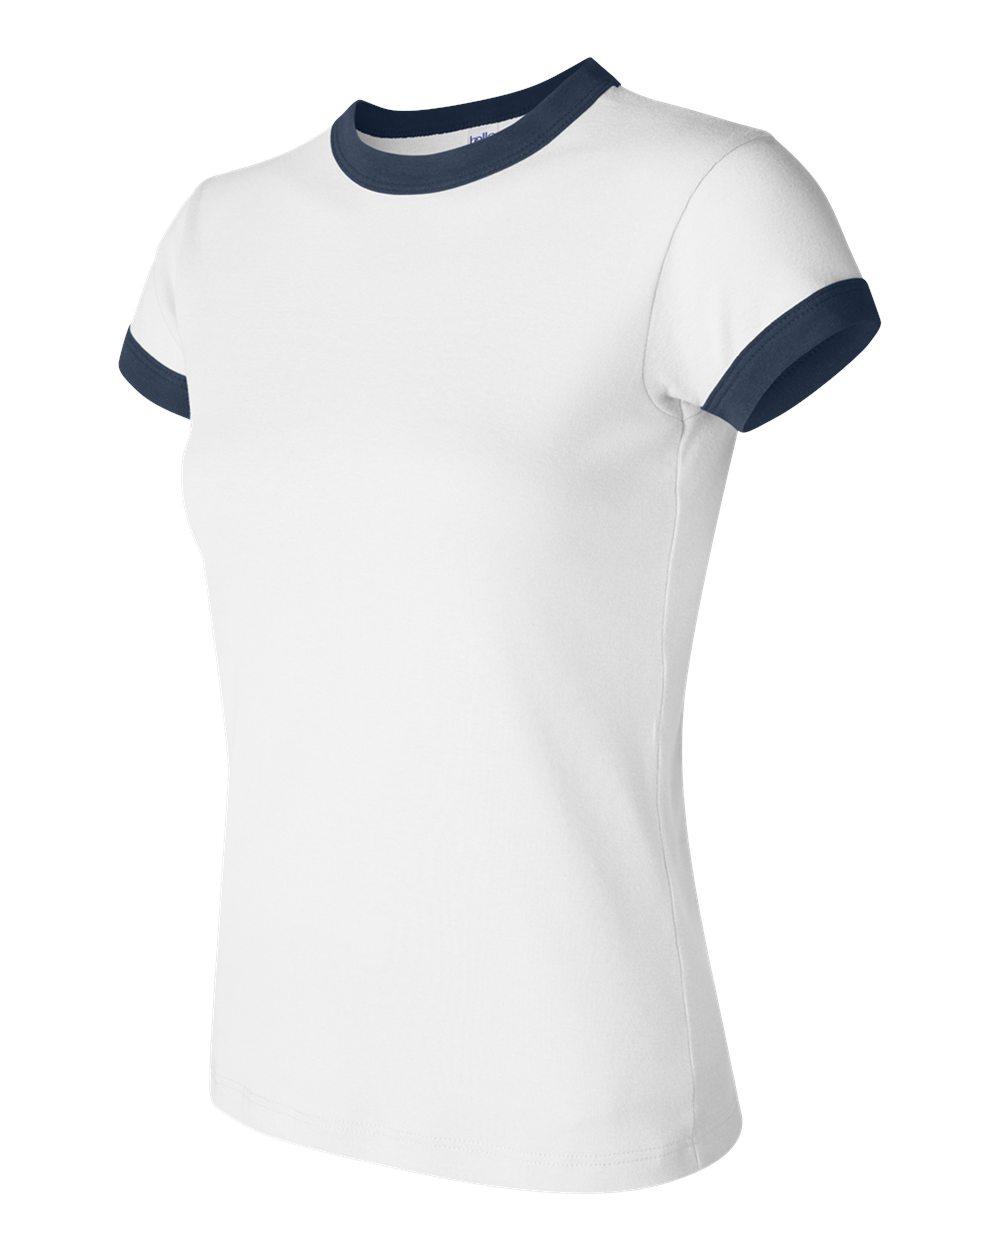 Bella 1007 White - Navy